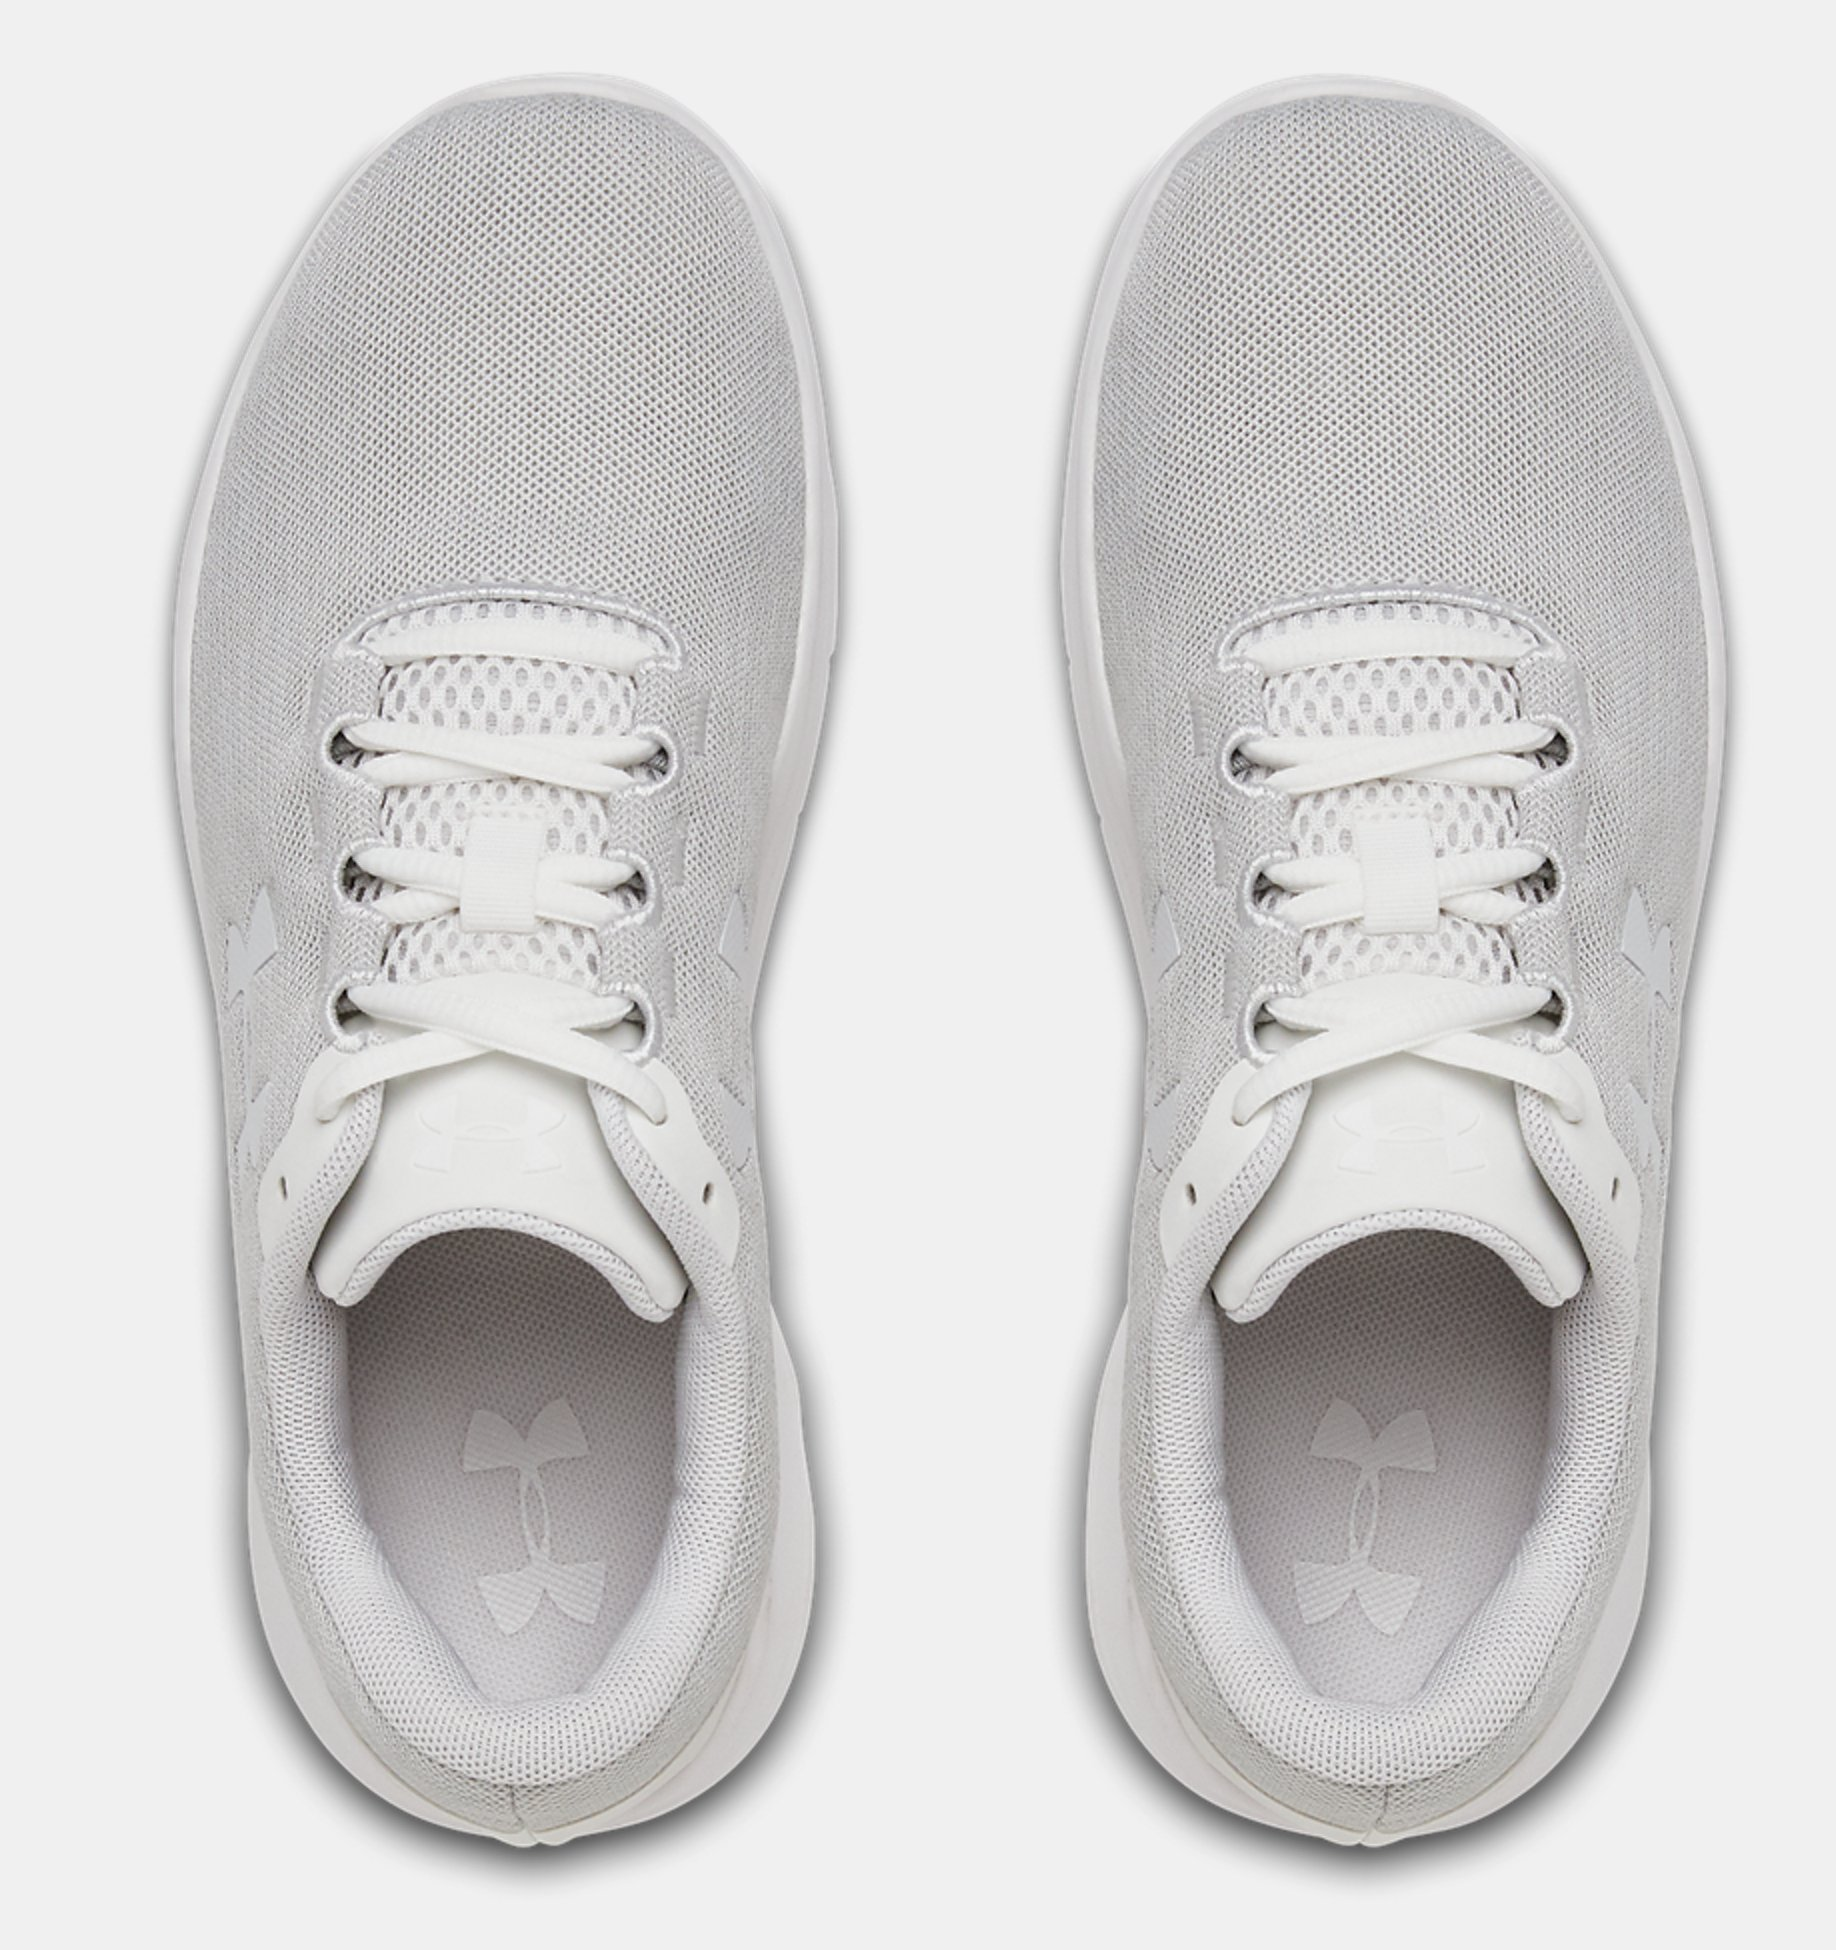 eb4a3f41071e7 ... Zapatillas de running UA Remix para mujer